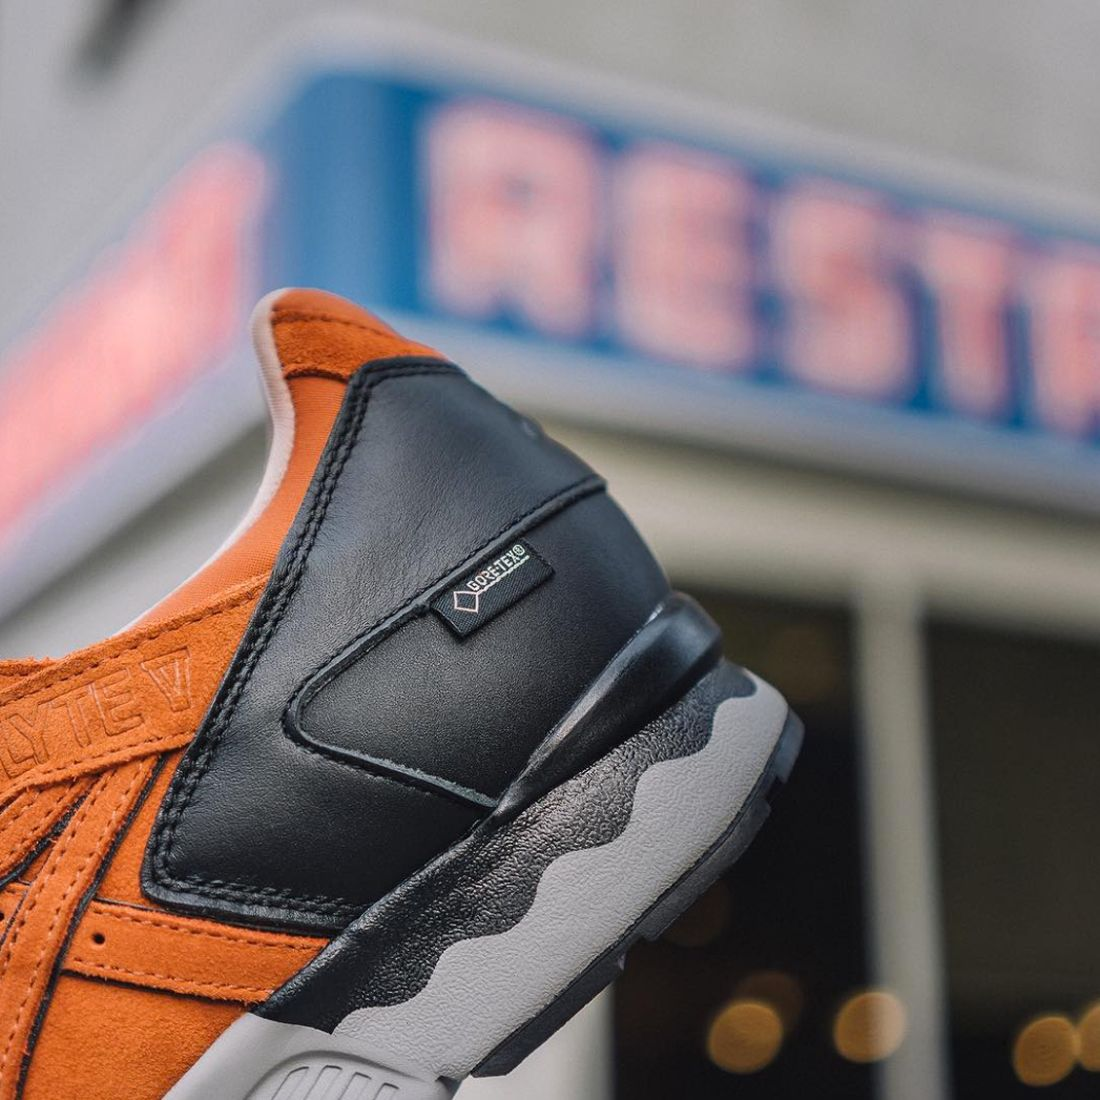 Packer Shoes X Asics Gel Lyte V Costanza2